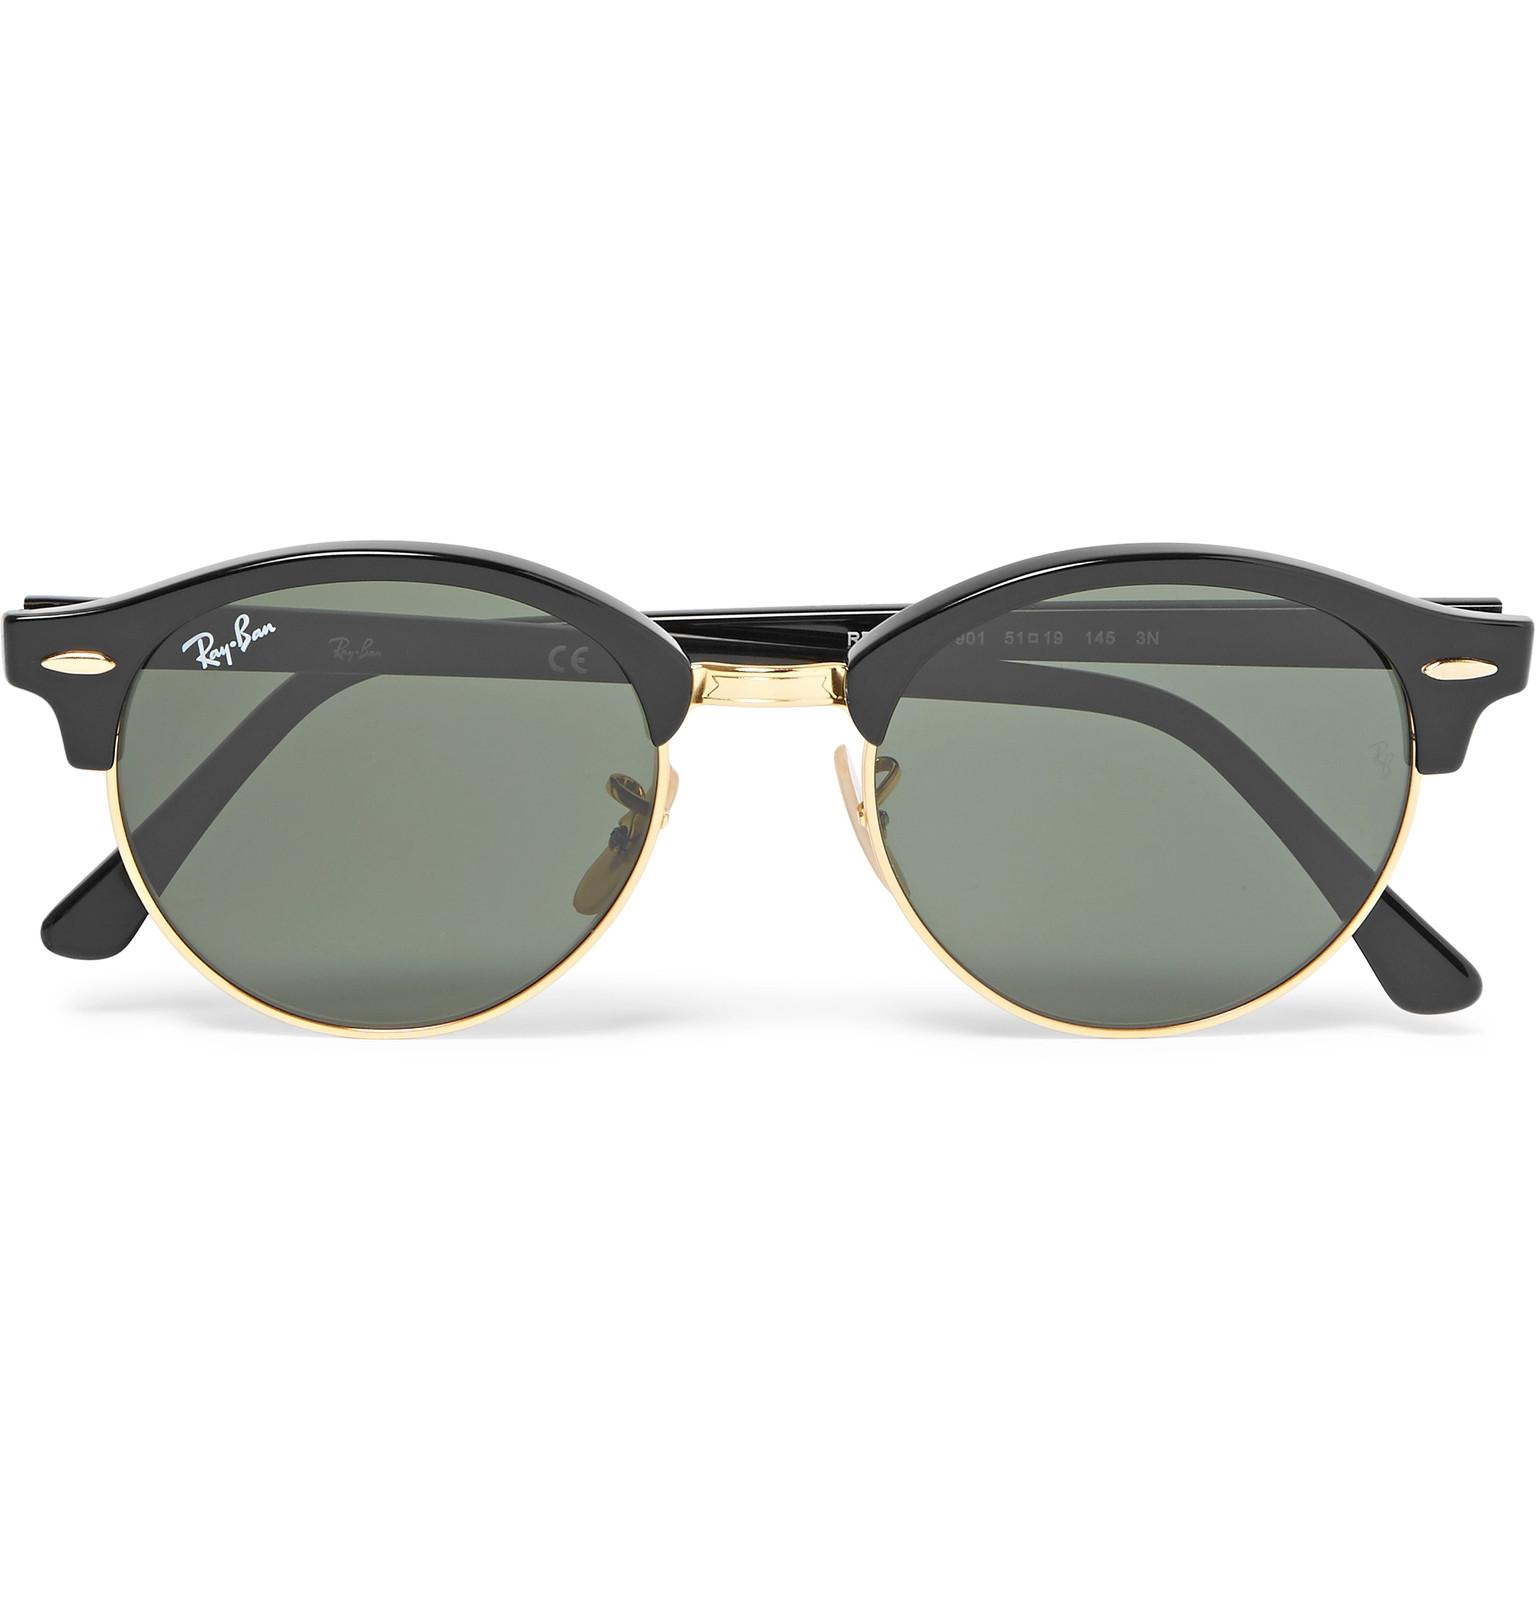 66de27bd9e Ray-BanClubmaster Round-Frame Acetate and Gold-Tone Polarised Sunglasses